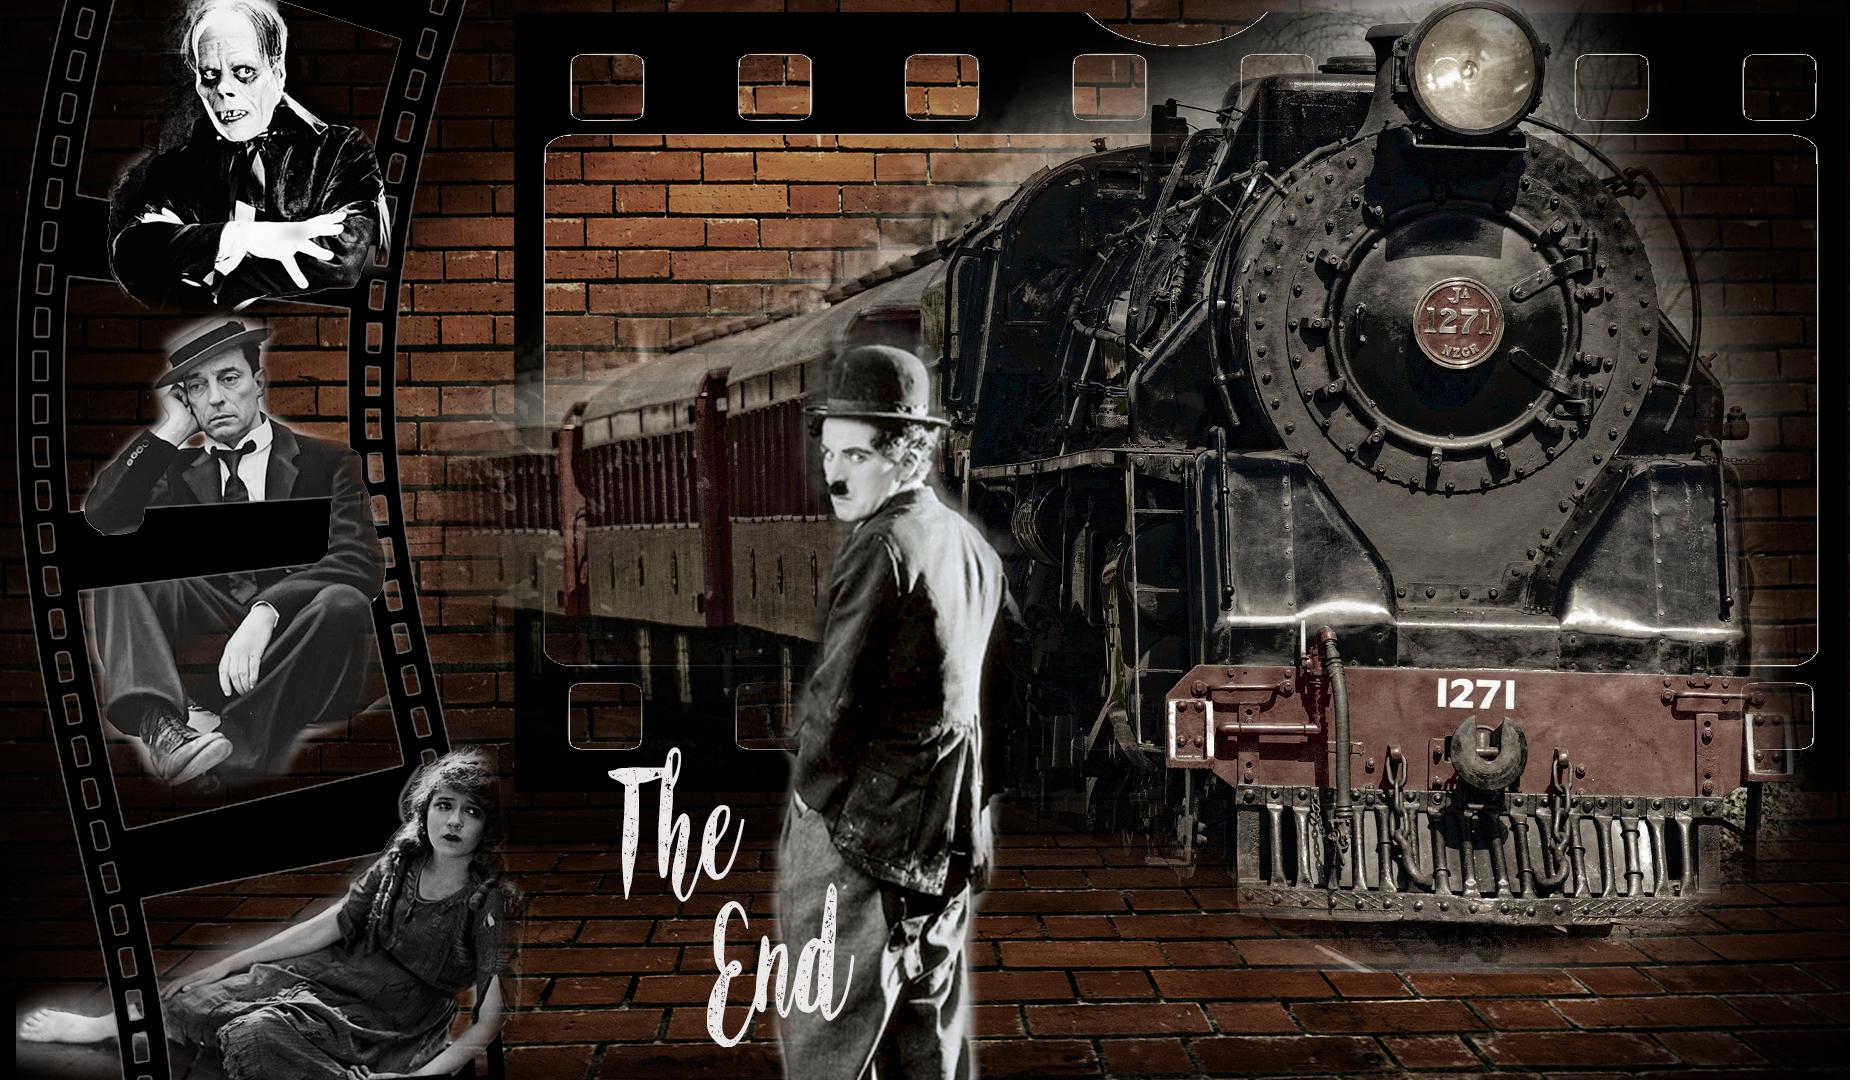 Homenaje al Cine Mudo- Buster Keaton, Mary Pickford, Nosferatur, Charles Chaplin-Charlot. Tren. Loco Mundo Arte y Bohemia